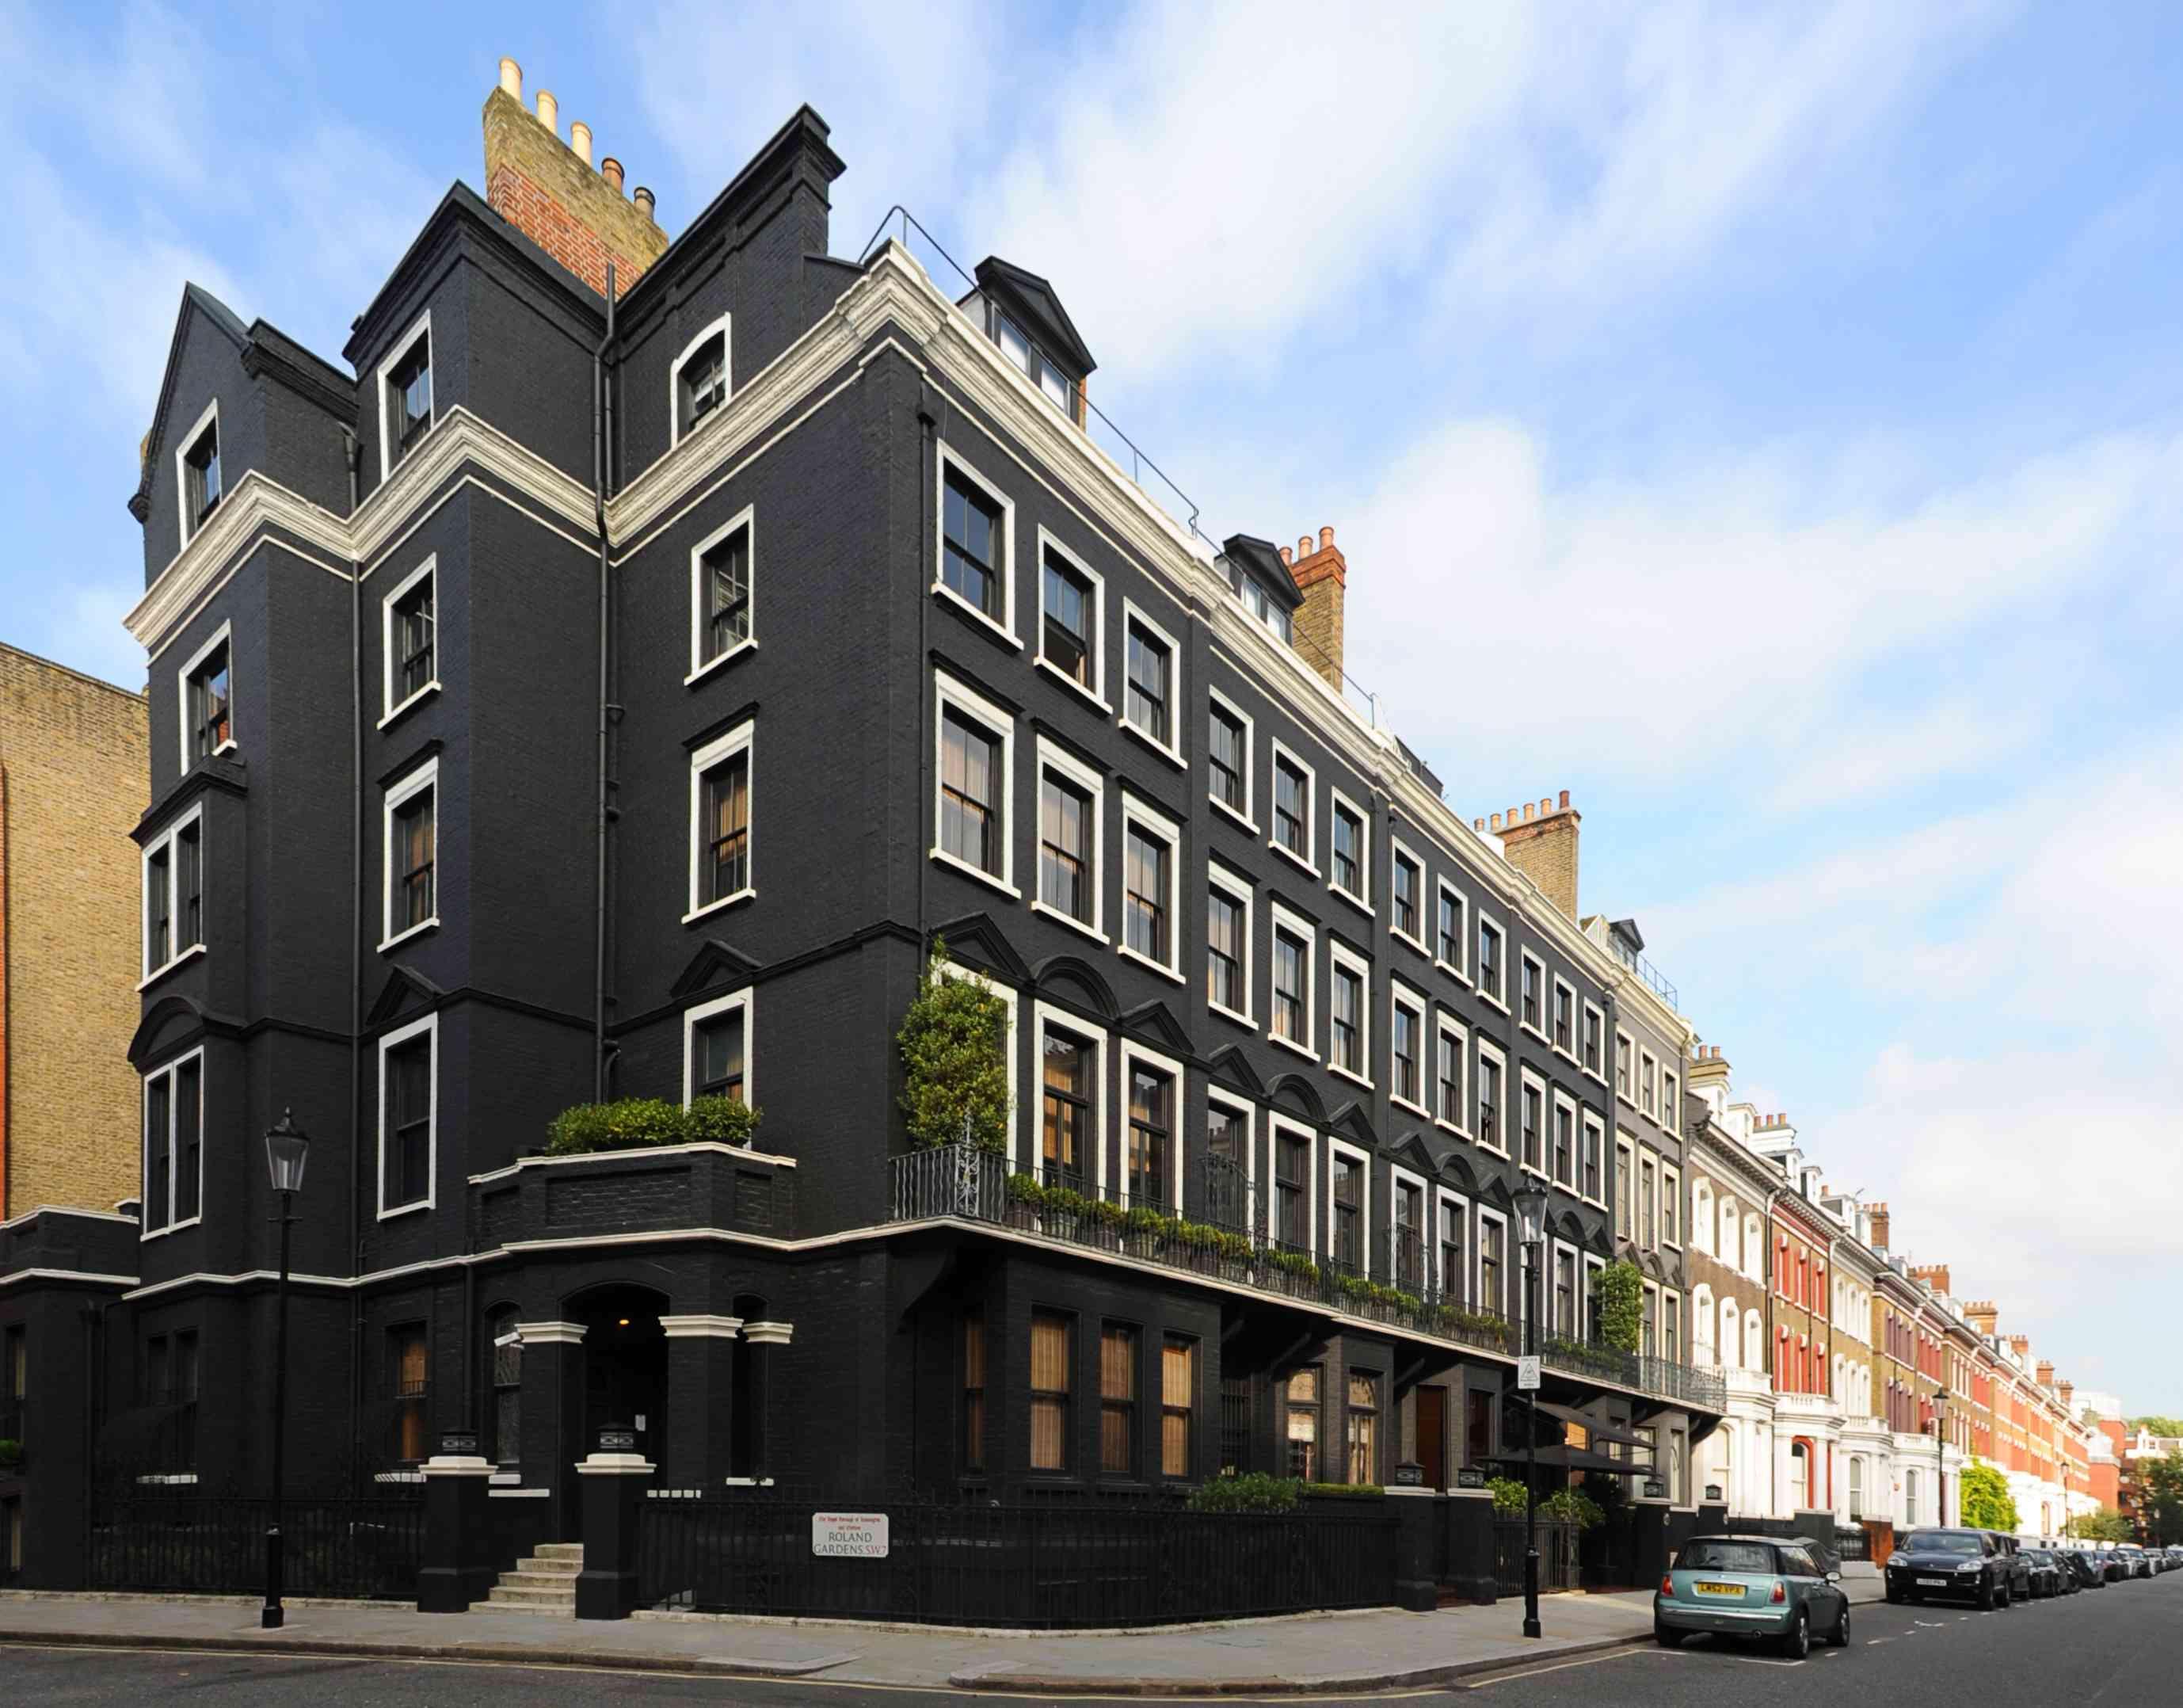 Blakes-Hotel-London.jpg